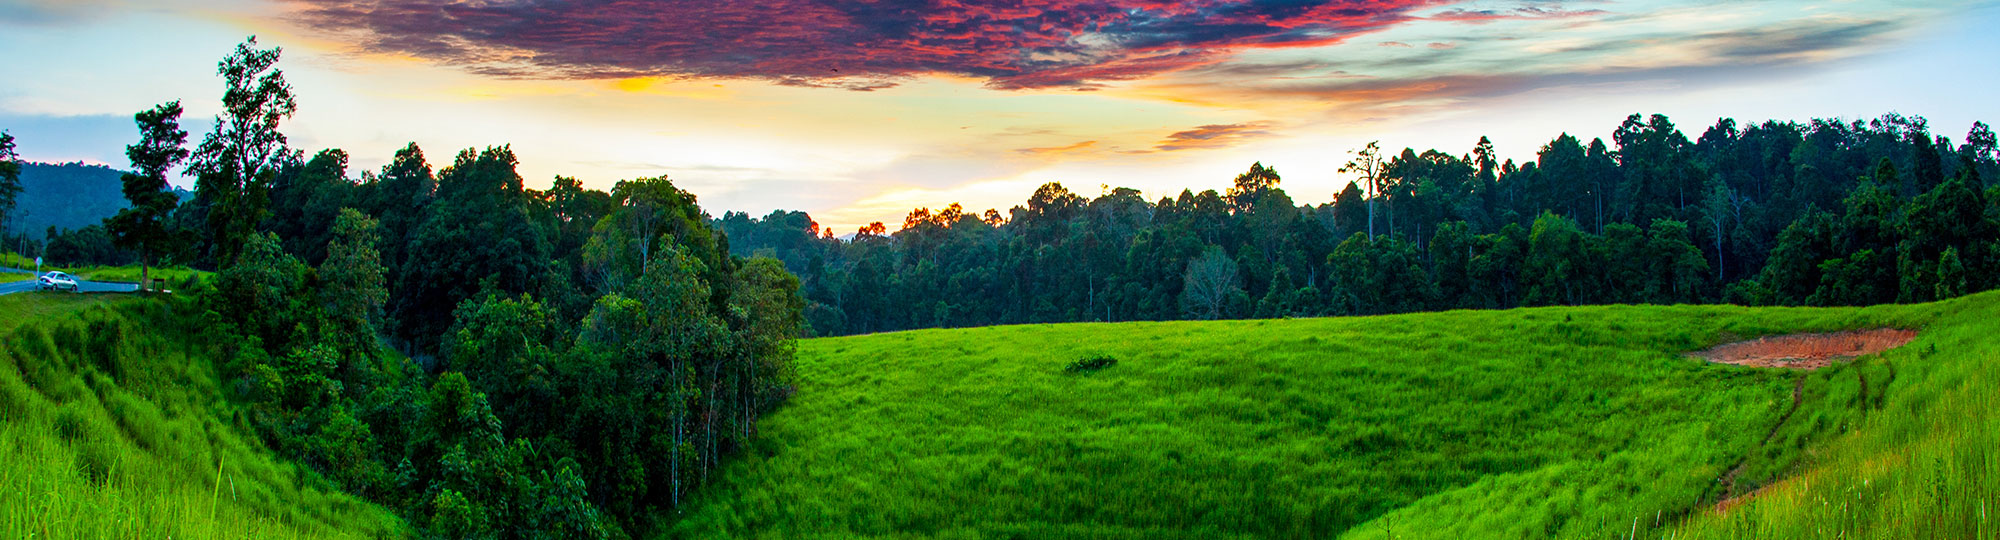 Beautiful Field with Green Grass